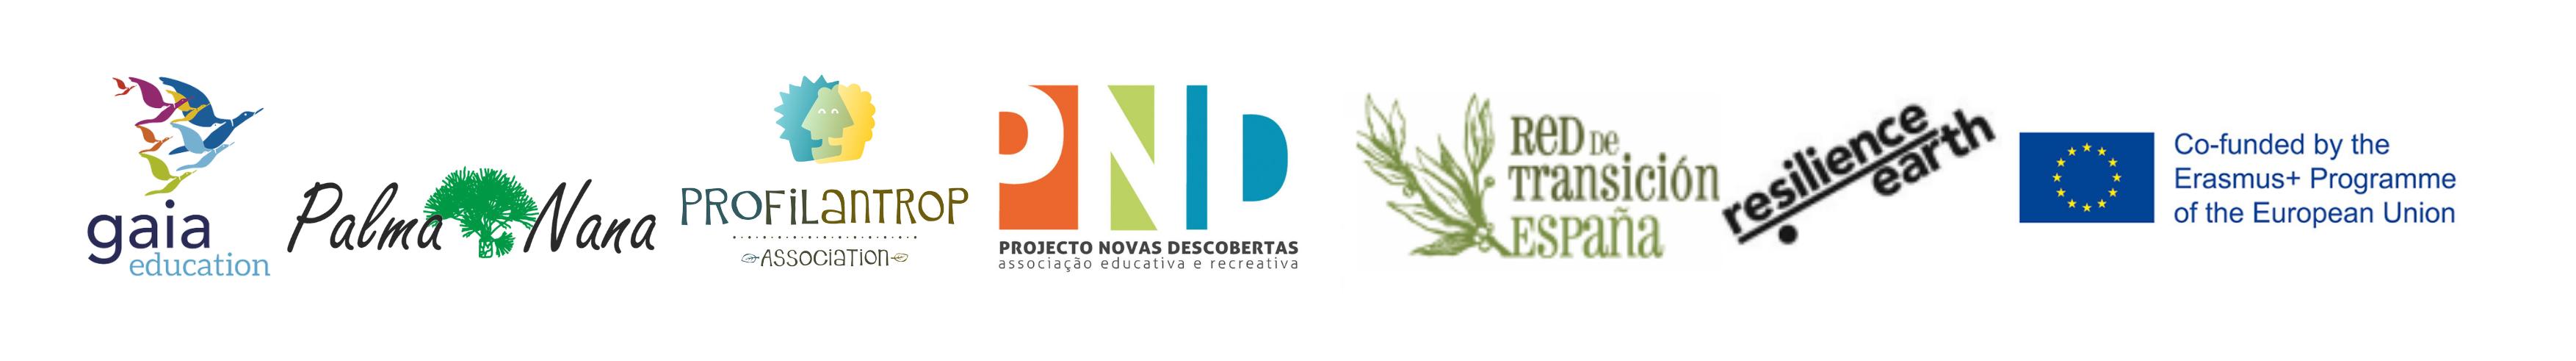 CCRD webpage banner